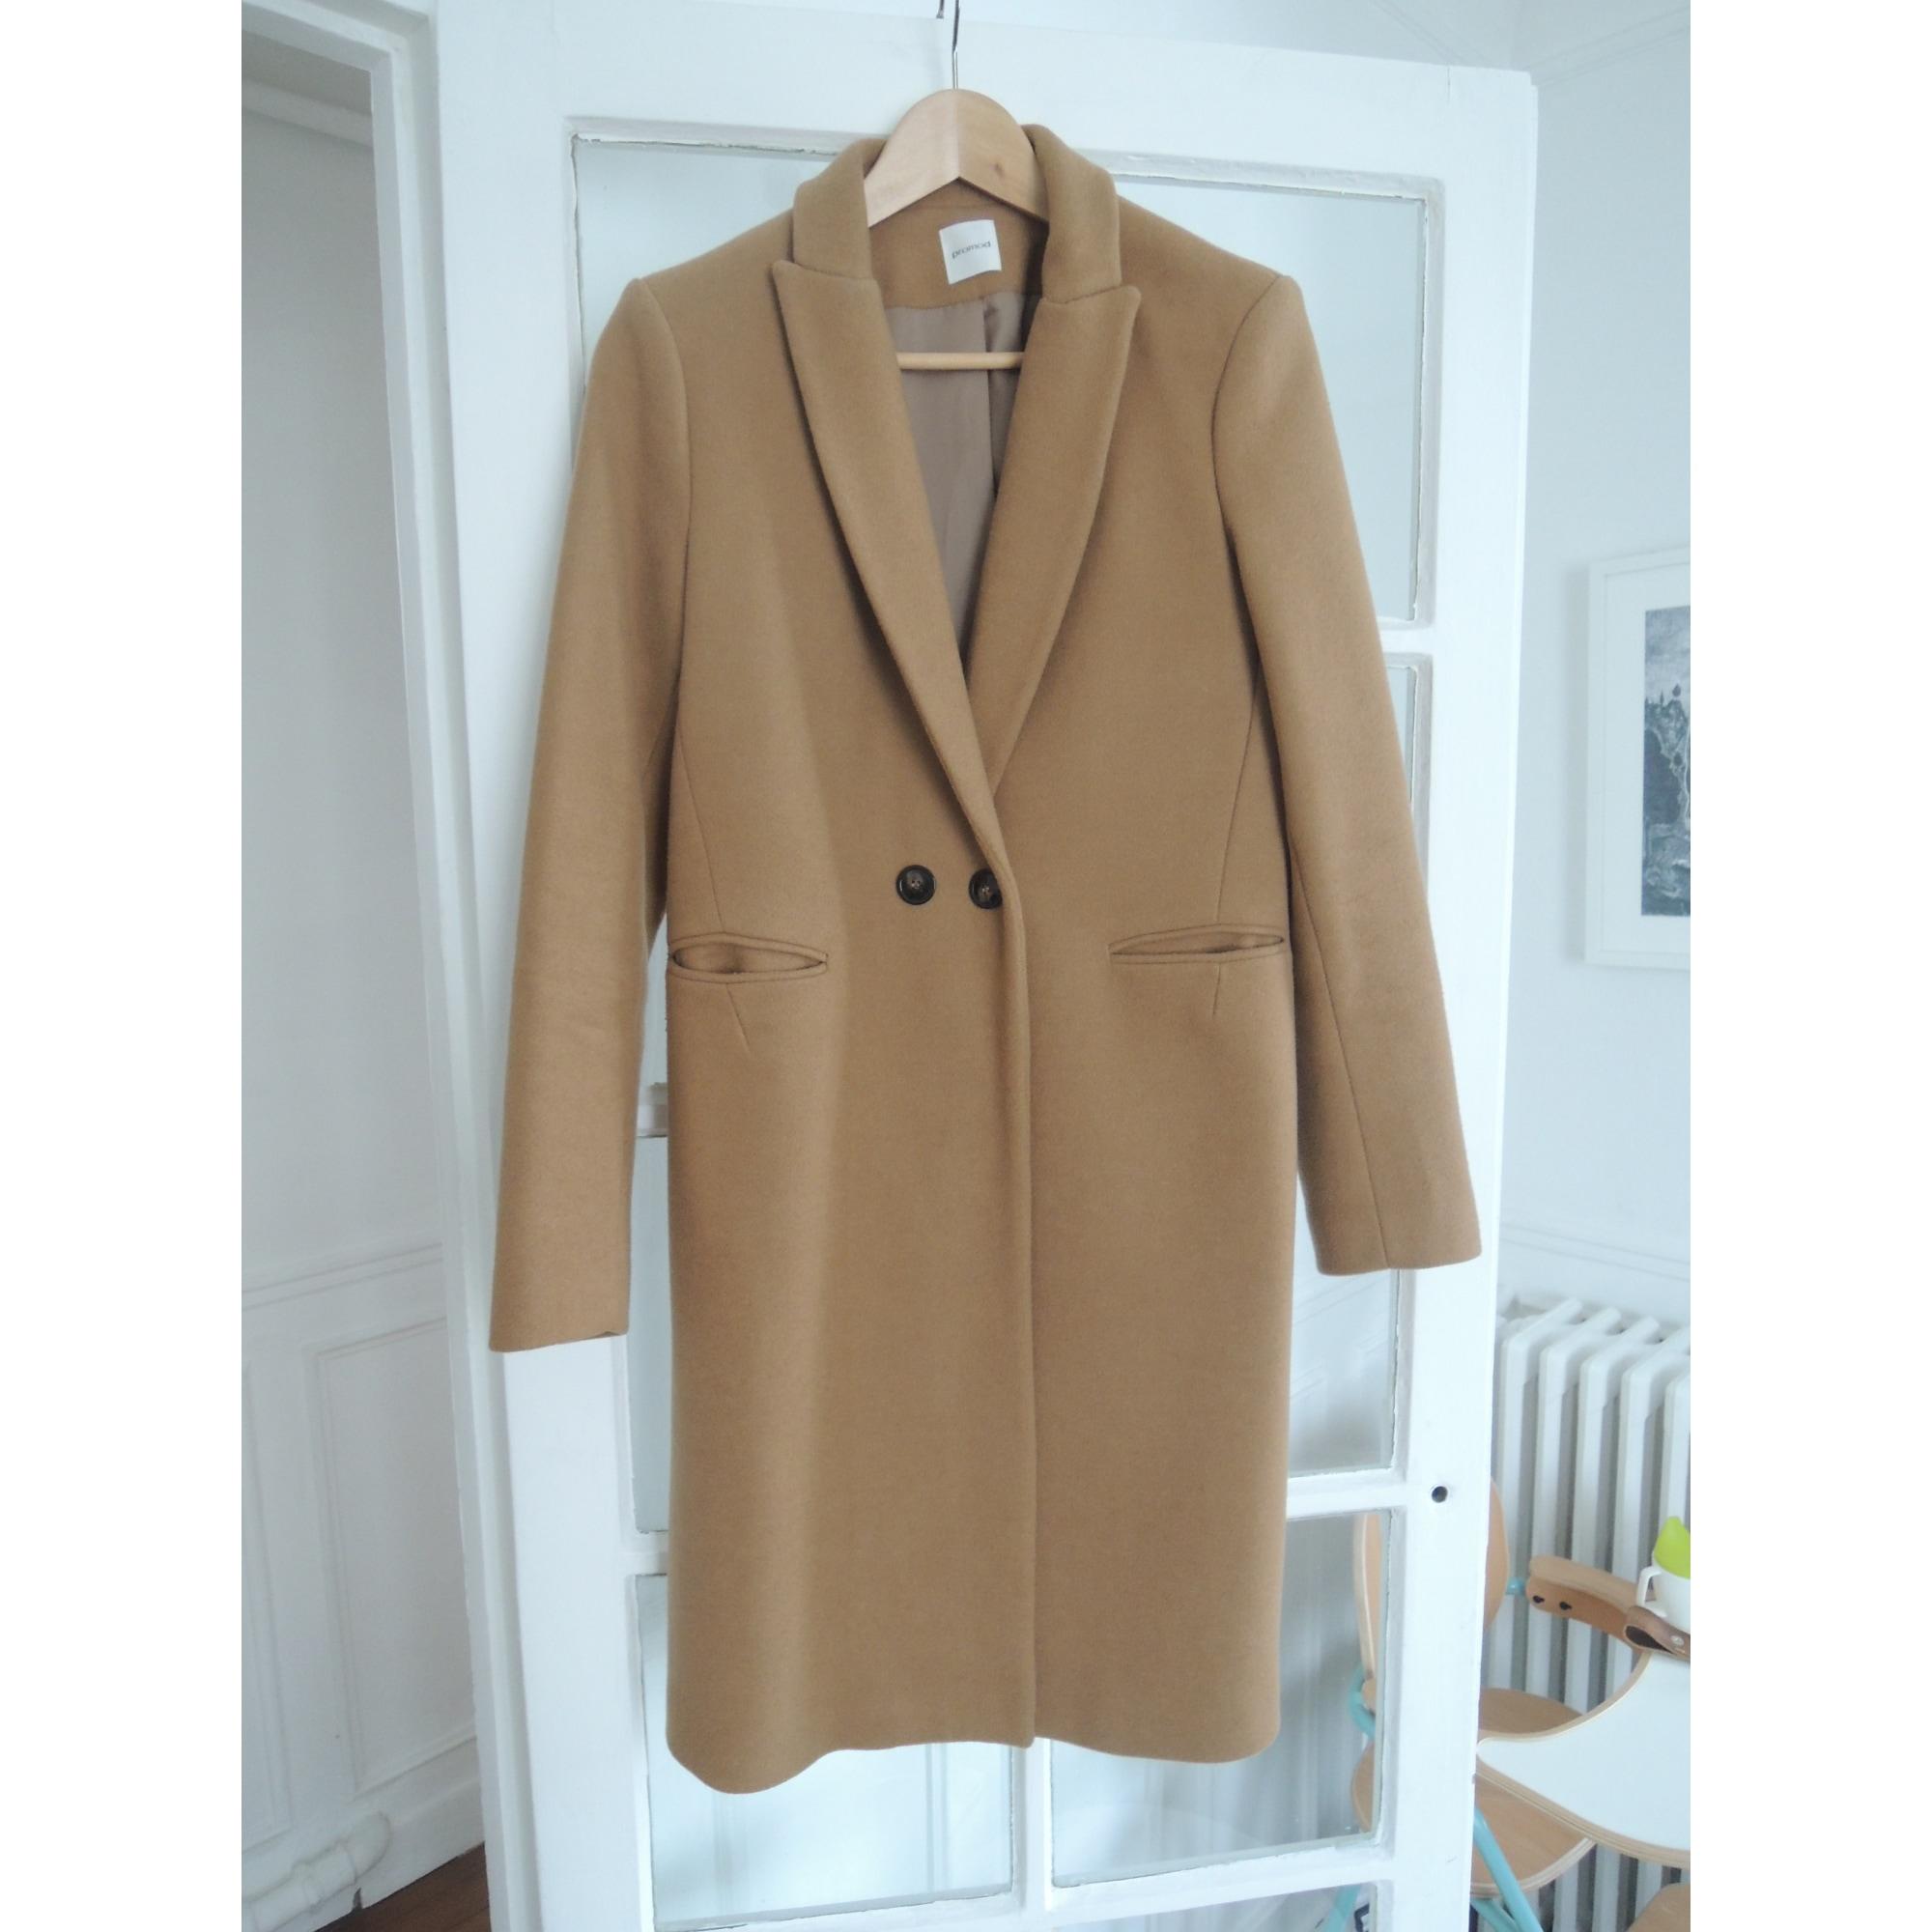 Manteau Zara Ou Zara Camel Ou Promod Manteau Promod Camel tCrxoshQdB